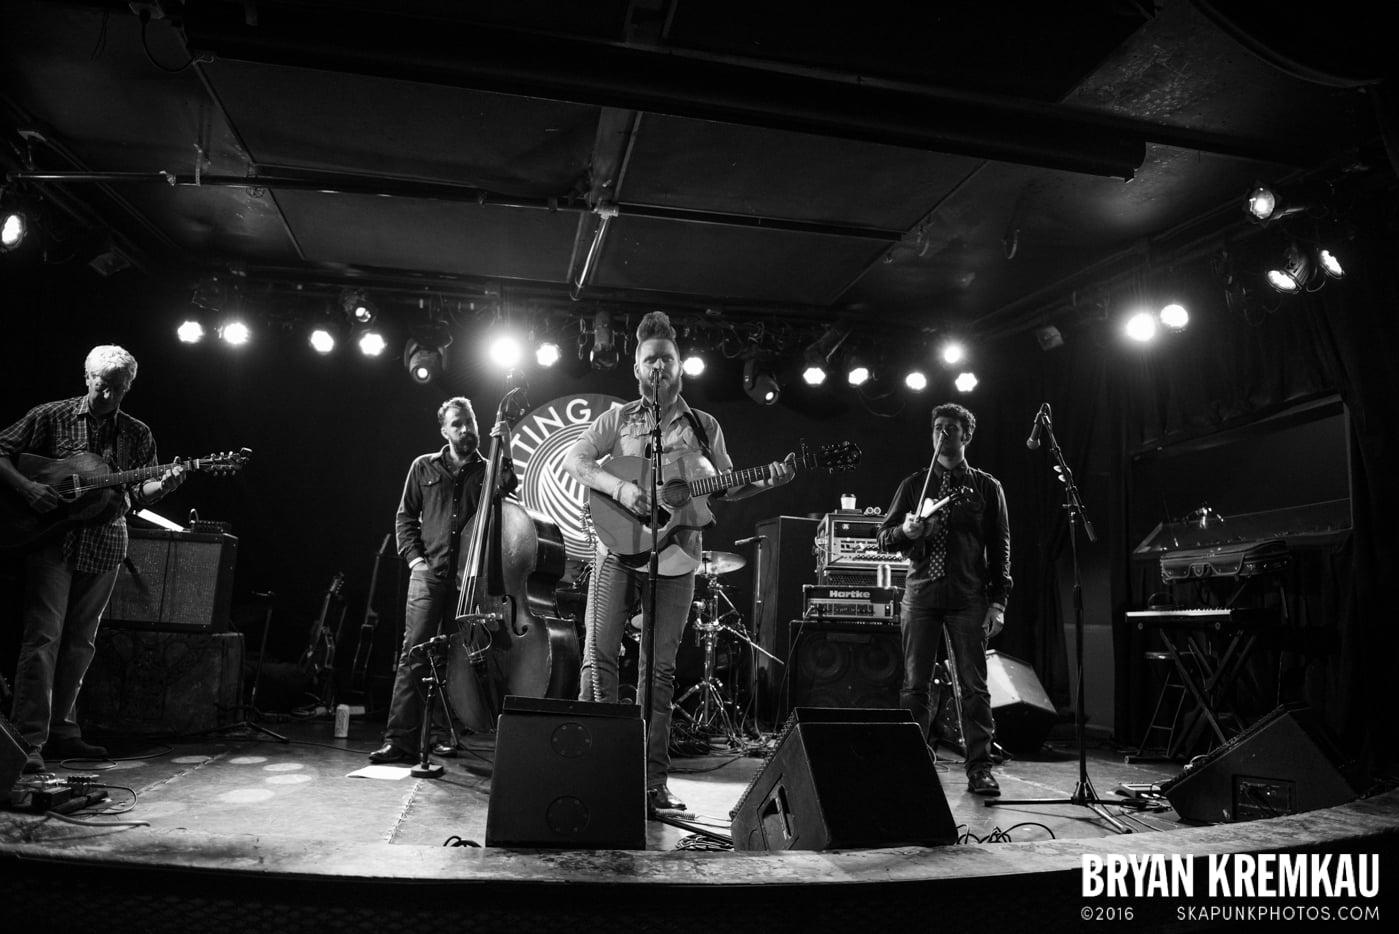 Danny Burns Band @ Knitting Factory, Brooklyn, NY - 9.10.14 (3)